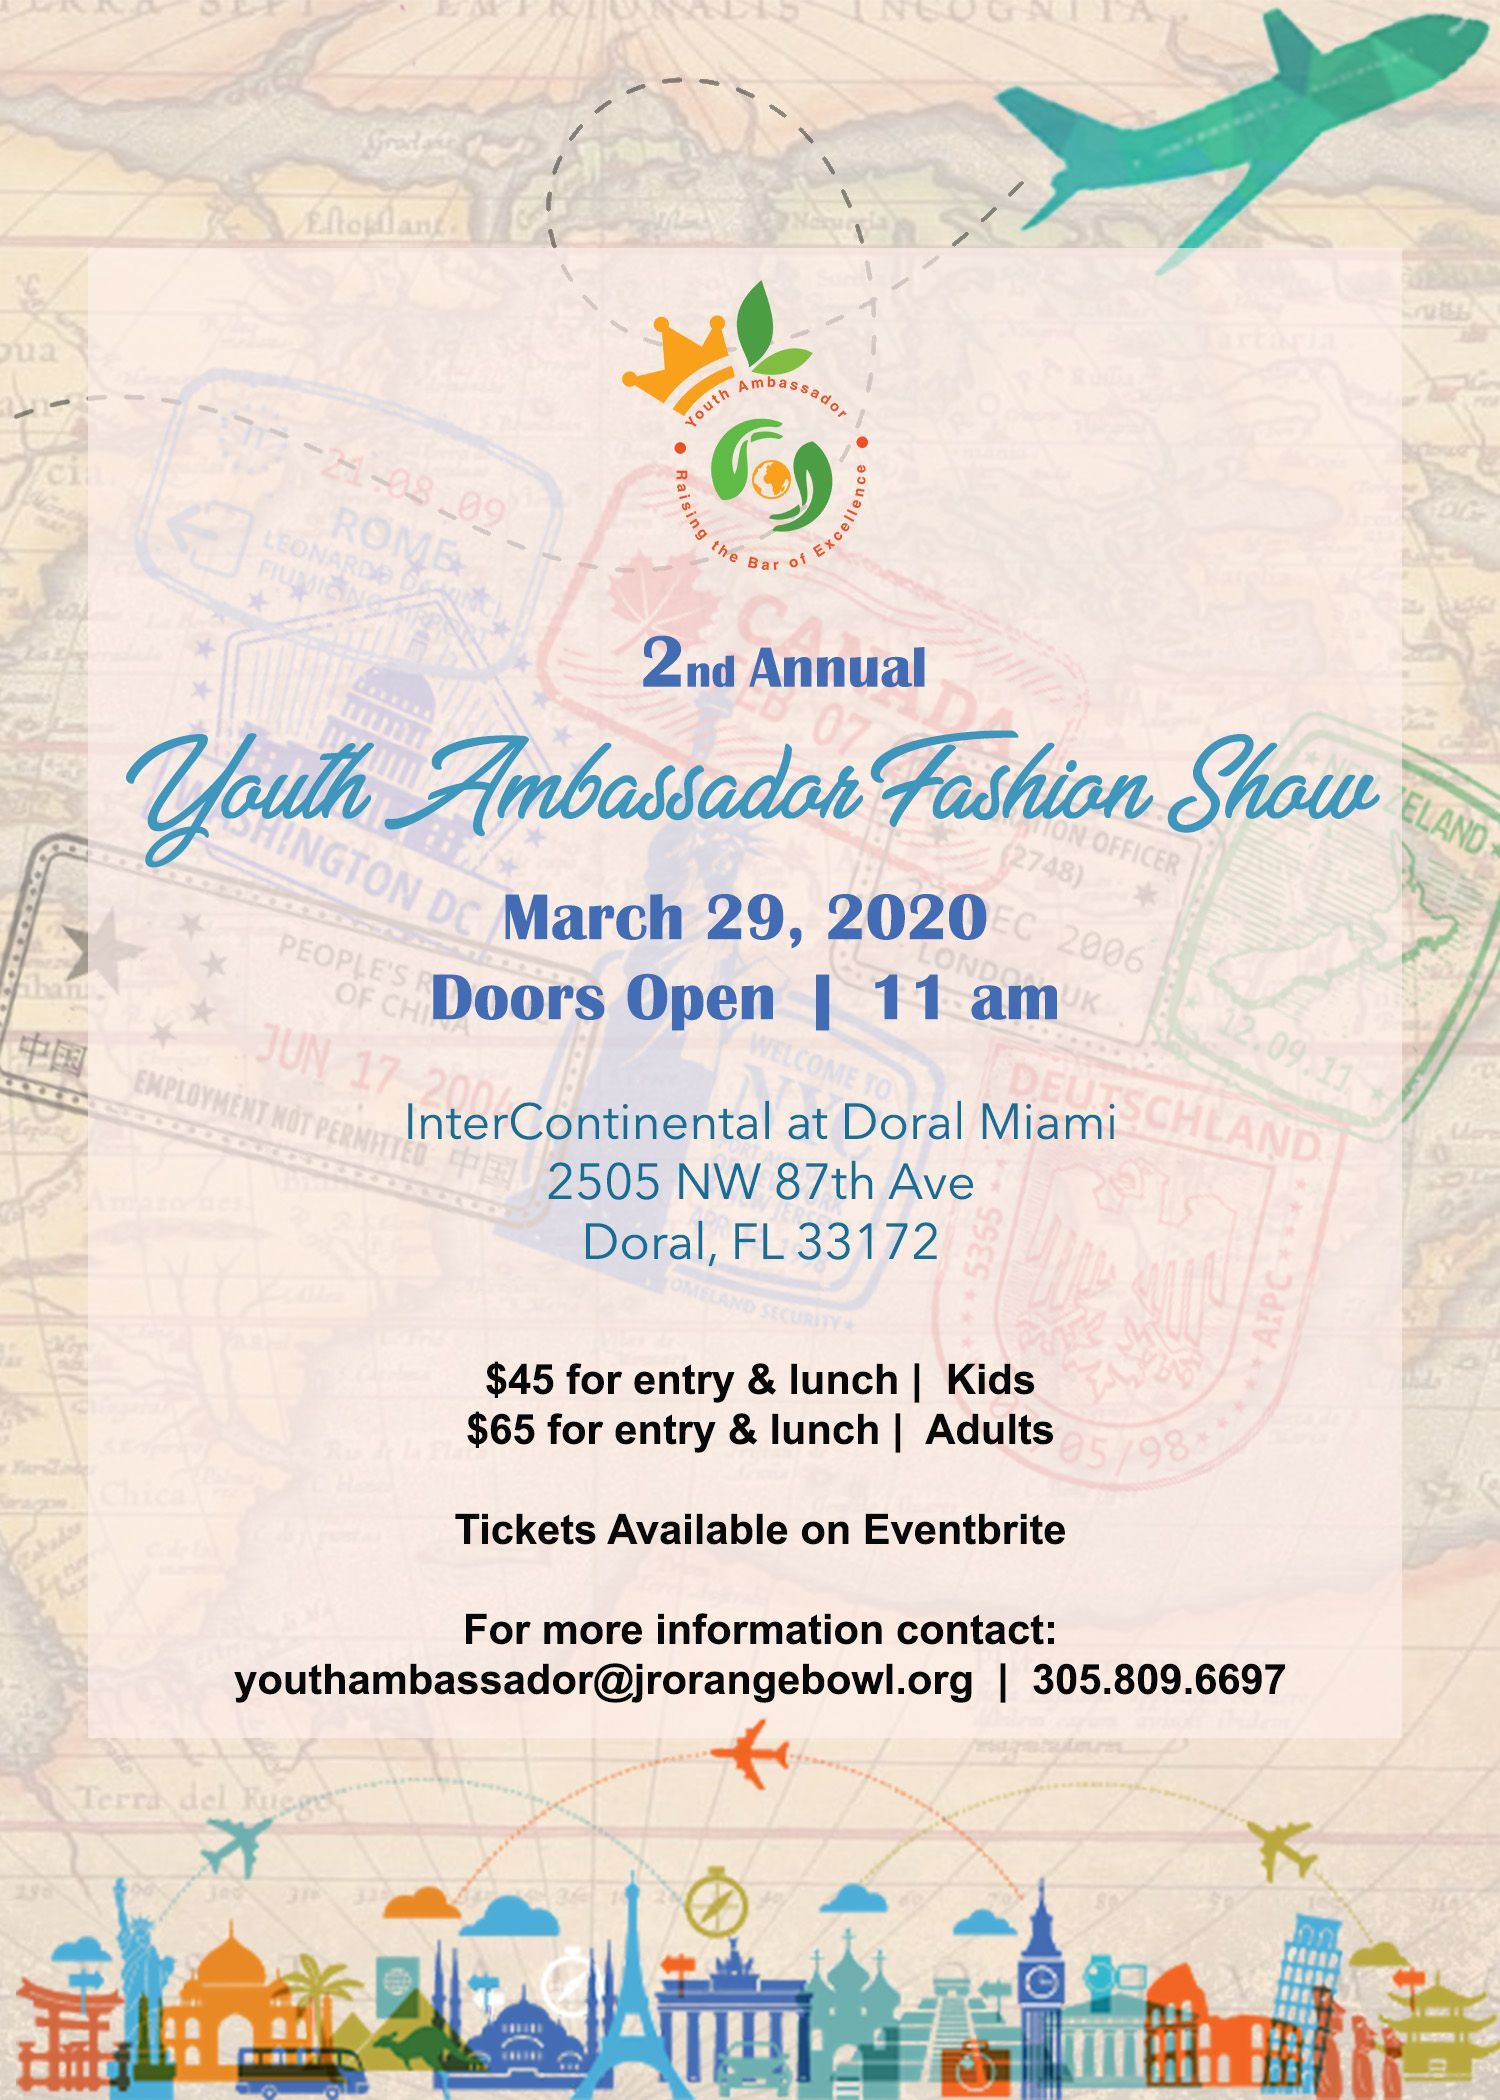 [Postponed} Youth Ambassador Fashion Show